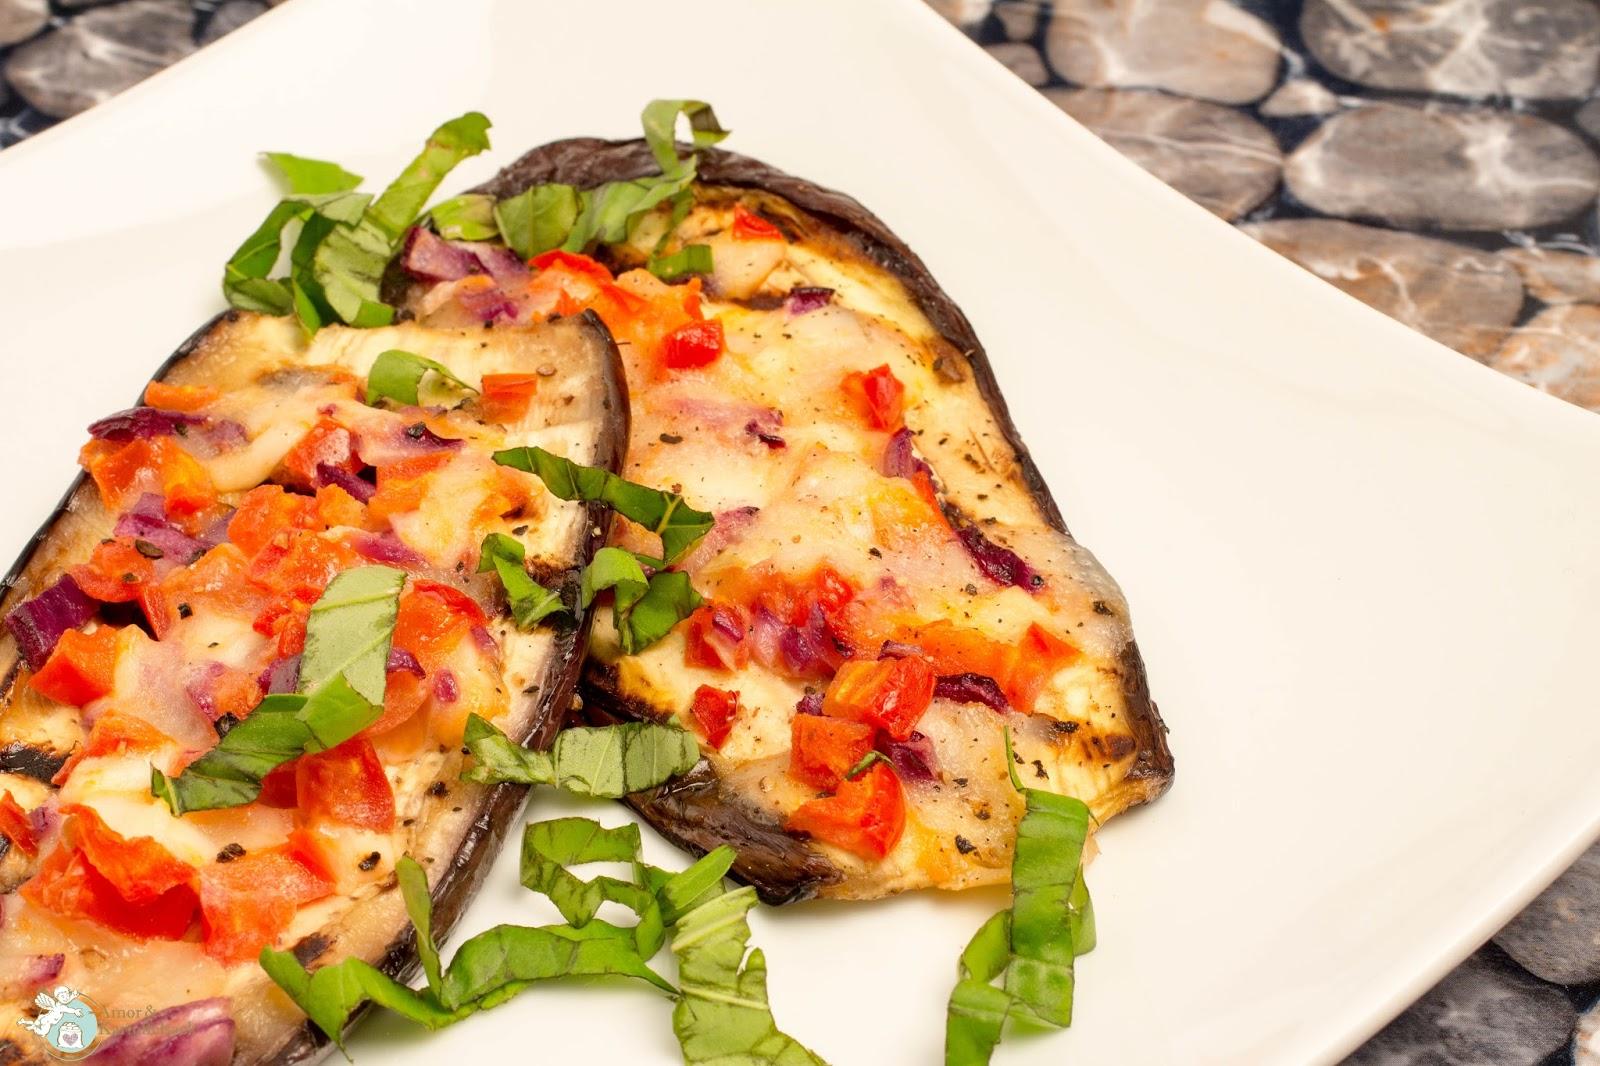 amor kartoffelsack pizza di melanzane low carb pizza. Black Bedroom Furniture Sets. Home Design Ideas